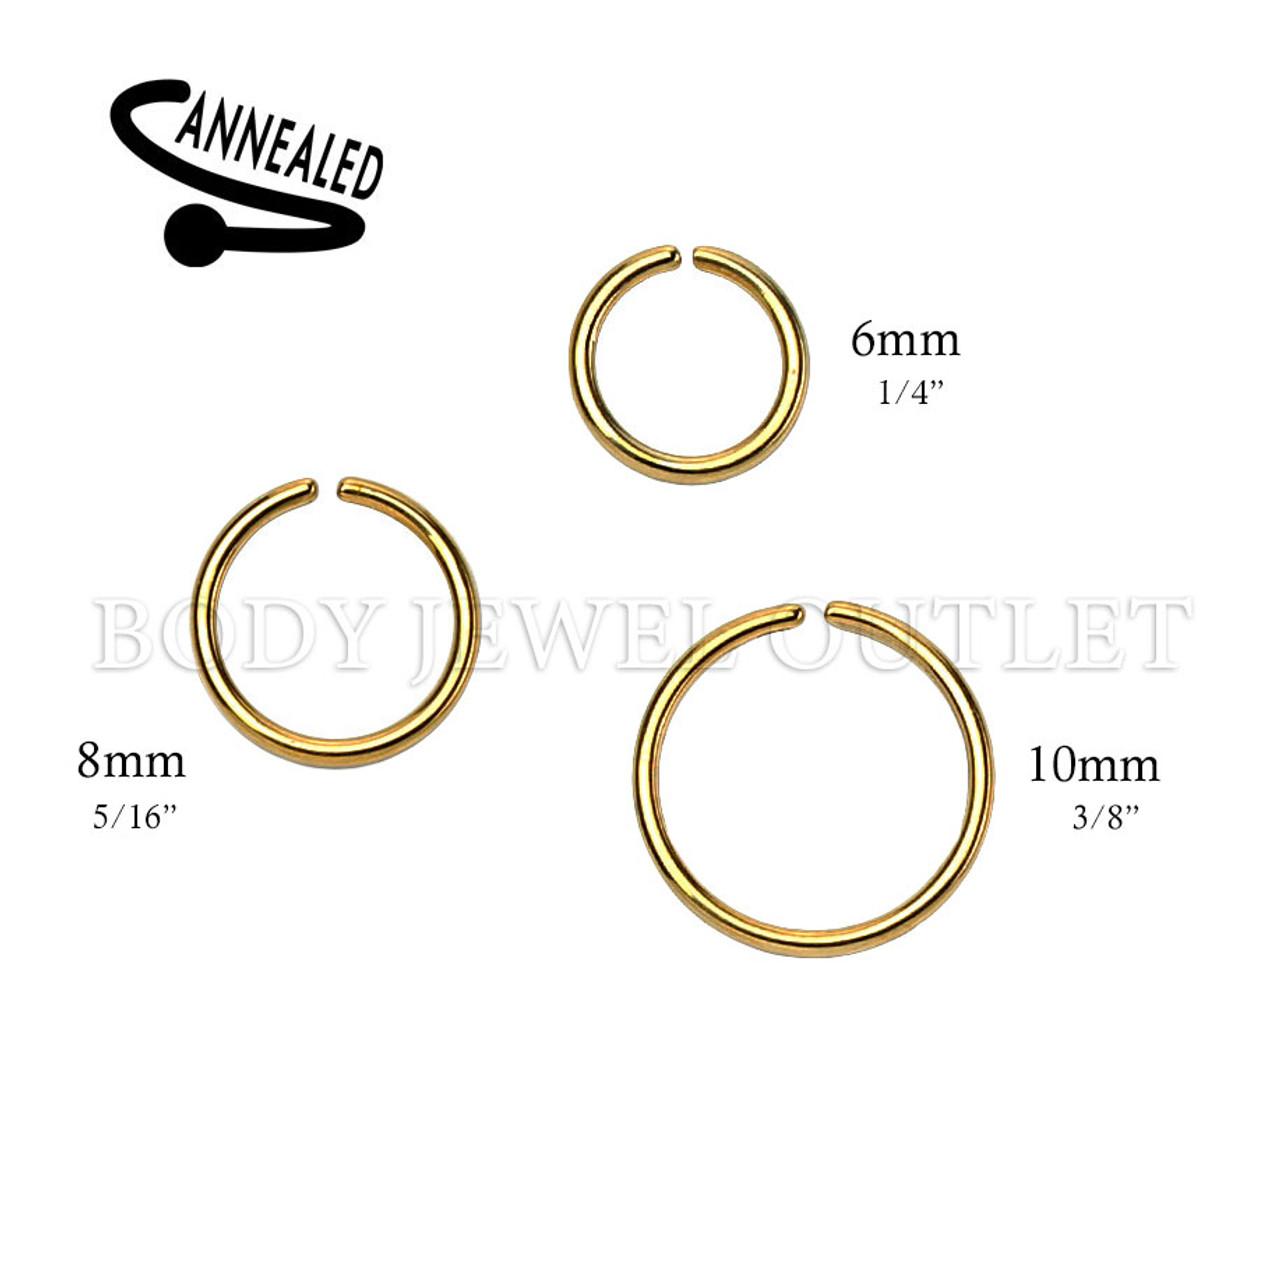 Gold IP Nose Hoop/Ring - 316L Surgical Steel Cut Ring Piercing - 20 Gauge (1 Piece)